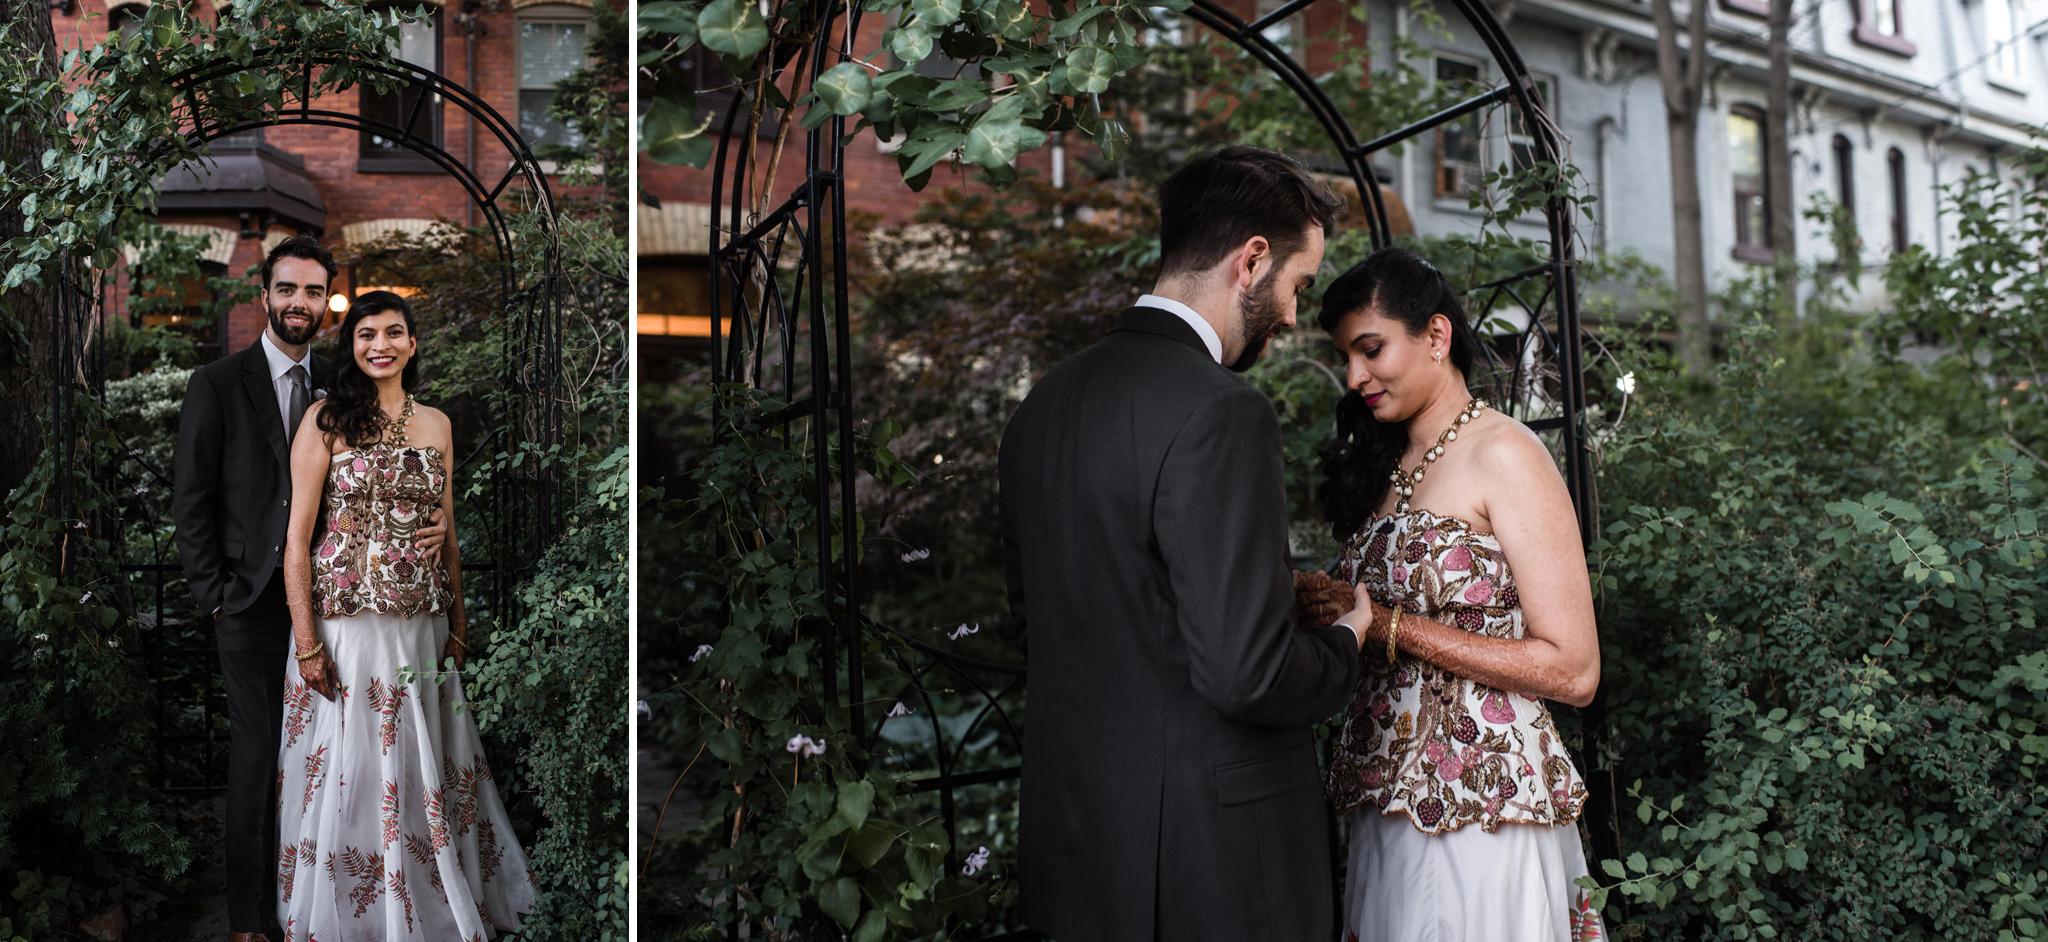 062-bride-groom-couple-wedding-photos-downtown-toronto-hotel-ocho.jpg